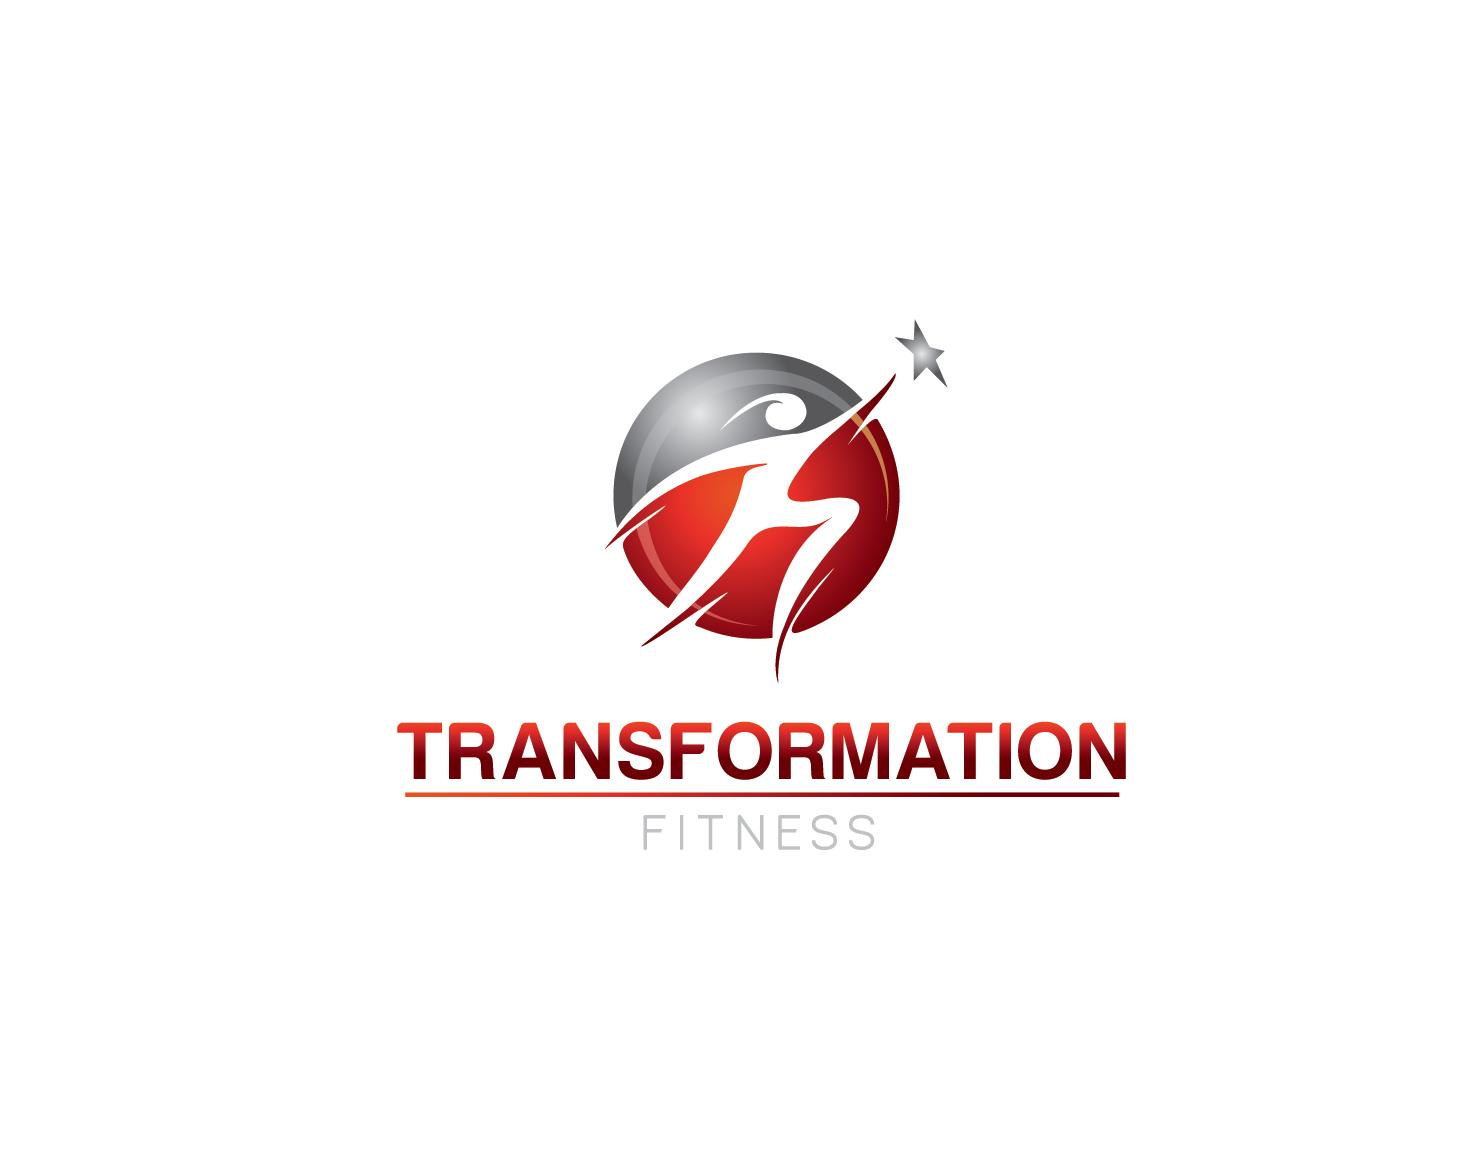 Logo Design by jerjer22 - Entry No. 101 in the Logo Design Contest Inspiring Logo Design for Transformation fitness.